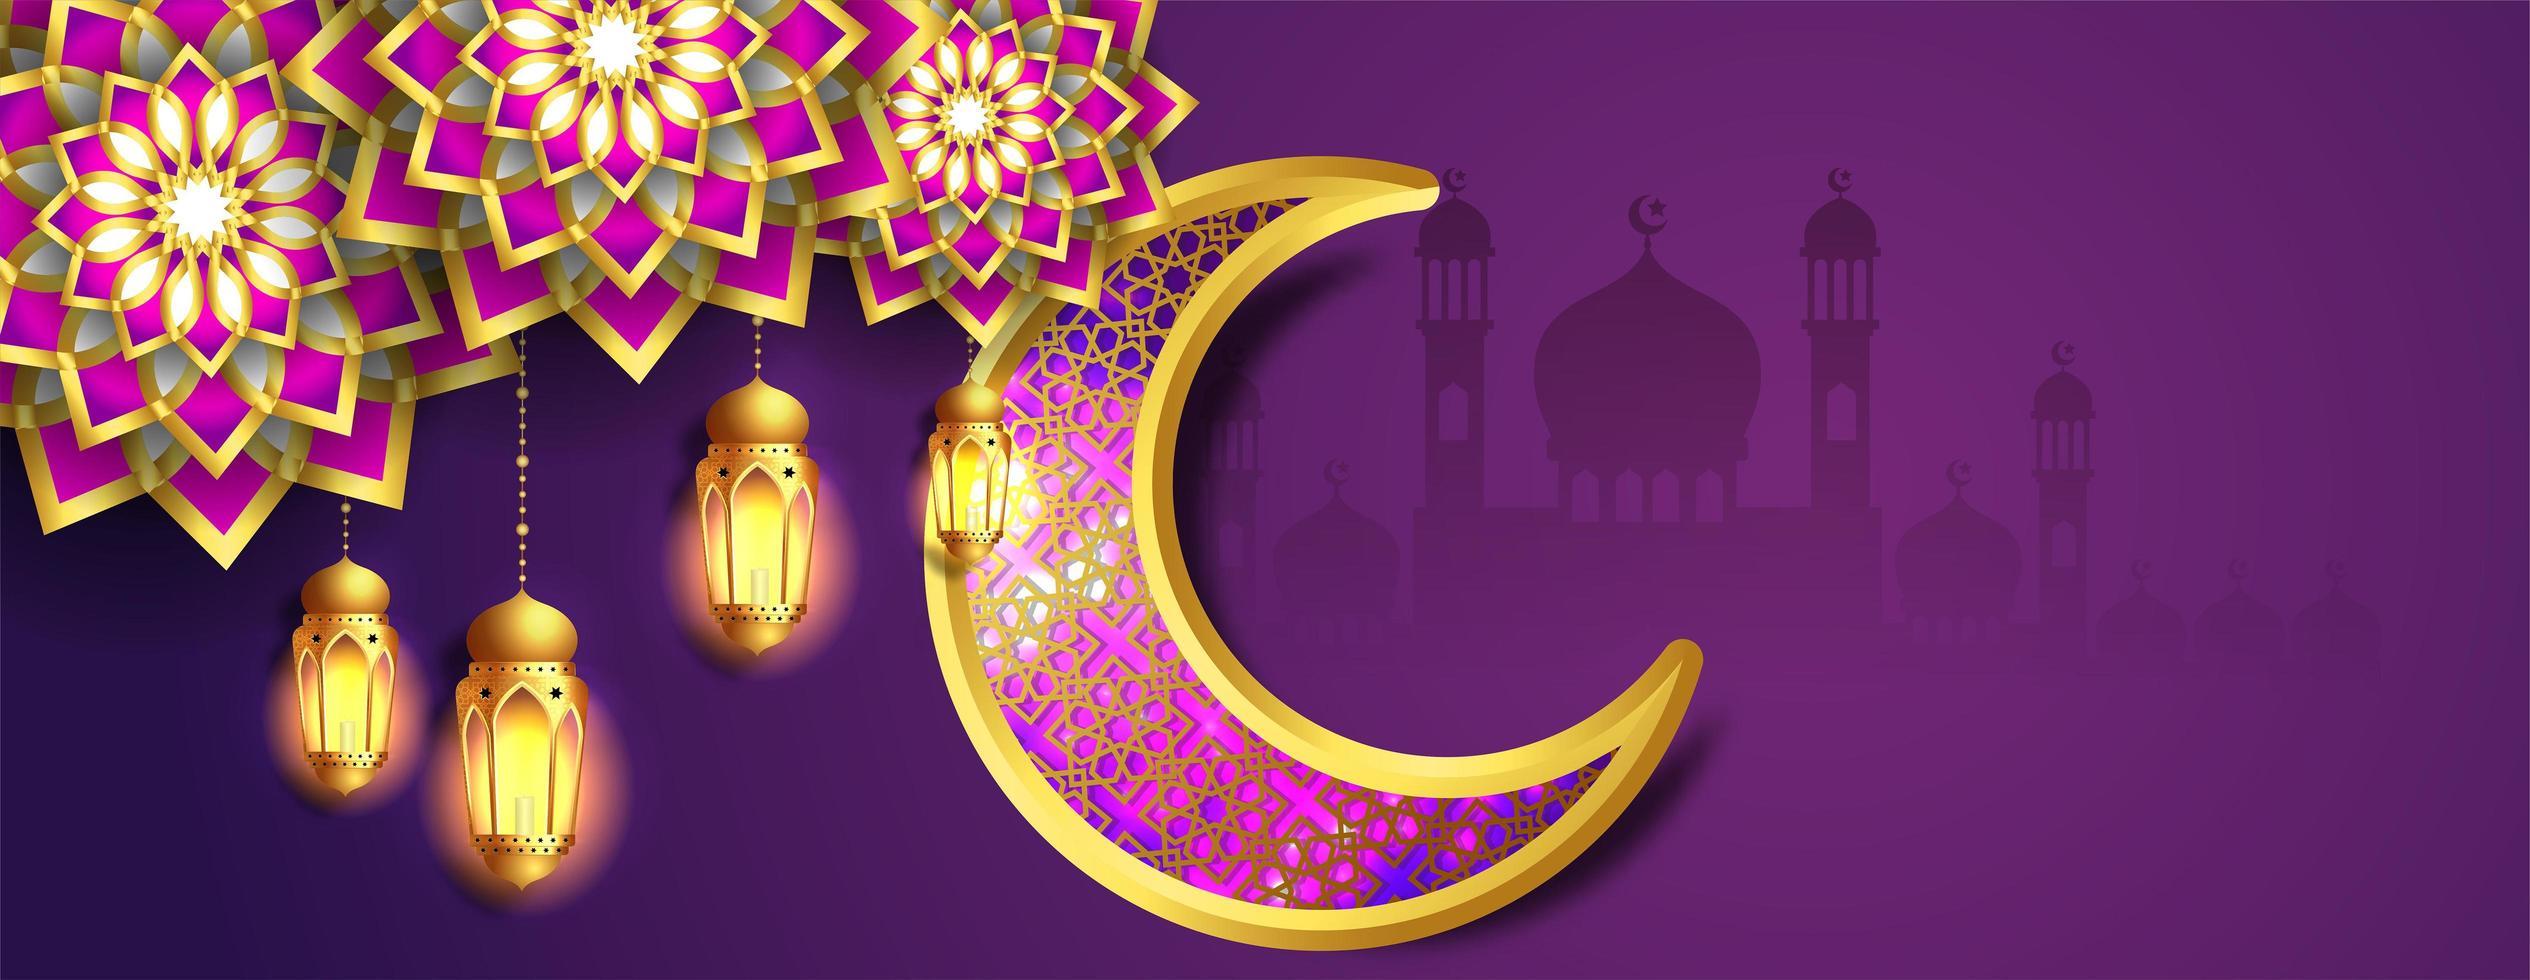 banner ramadan kareem viola con mezzaluna mosaico vettore